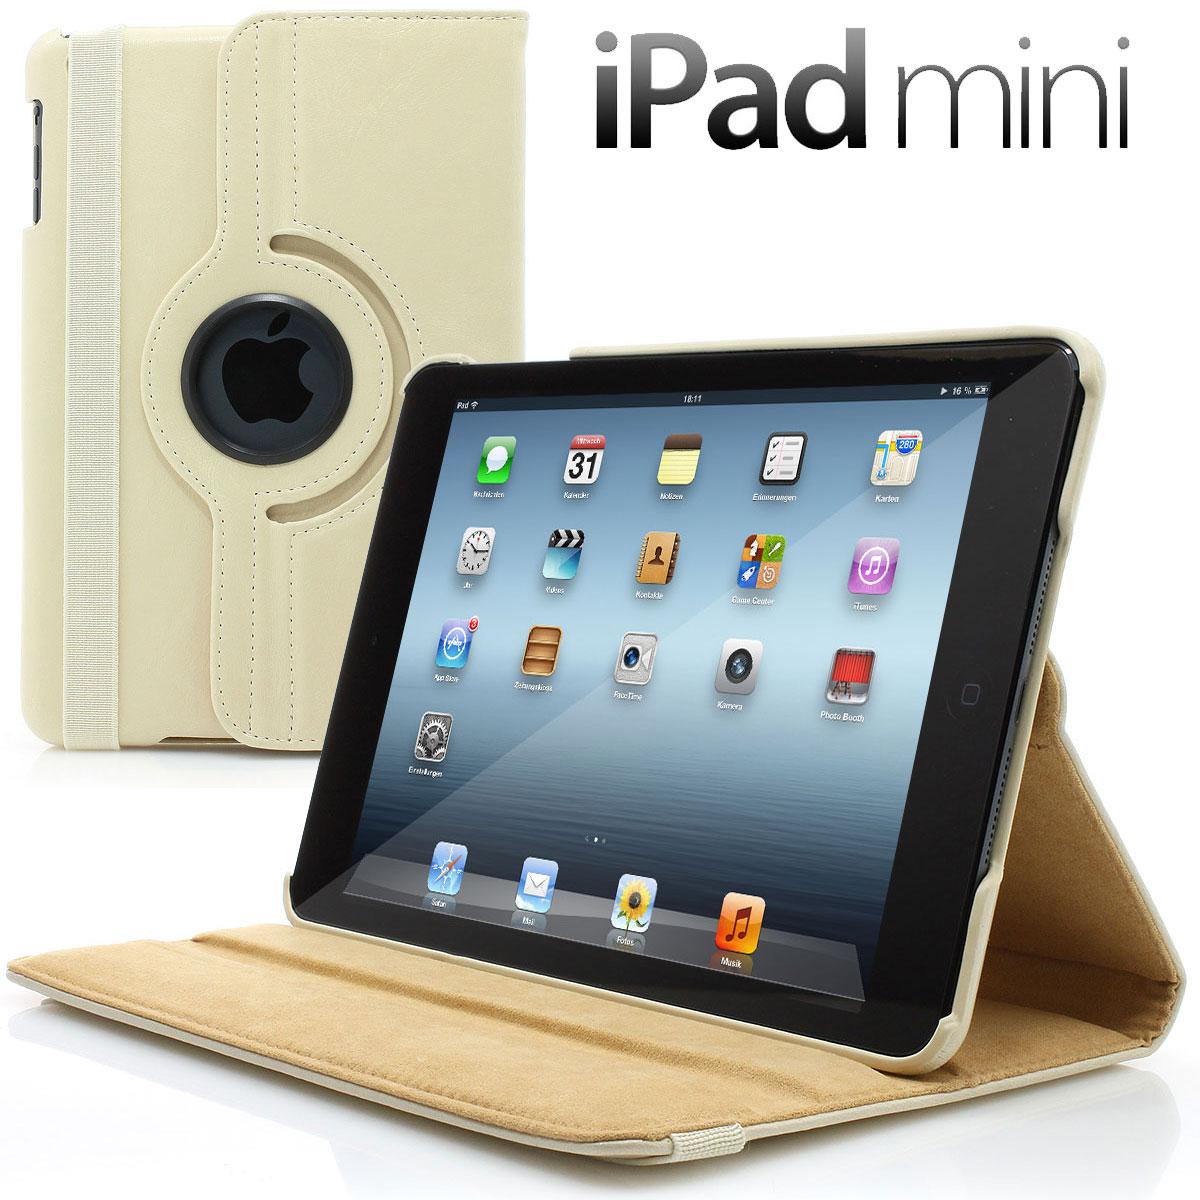 apple ipad mini retina smart schutz h lle leder tasche case cover original beige ebay. Black Bedroom Furniture Sets. Home Design Ideas